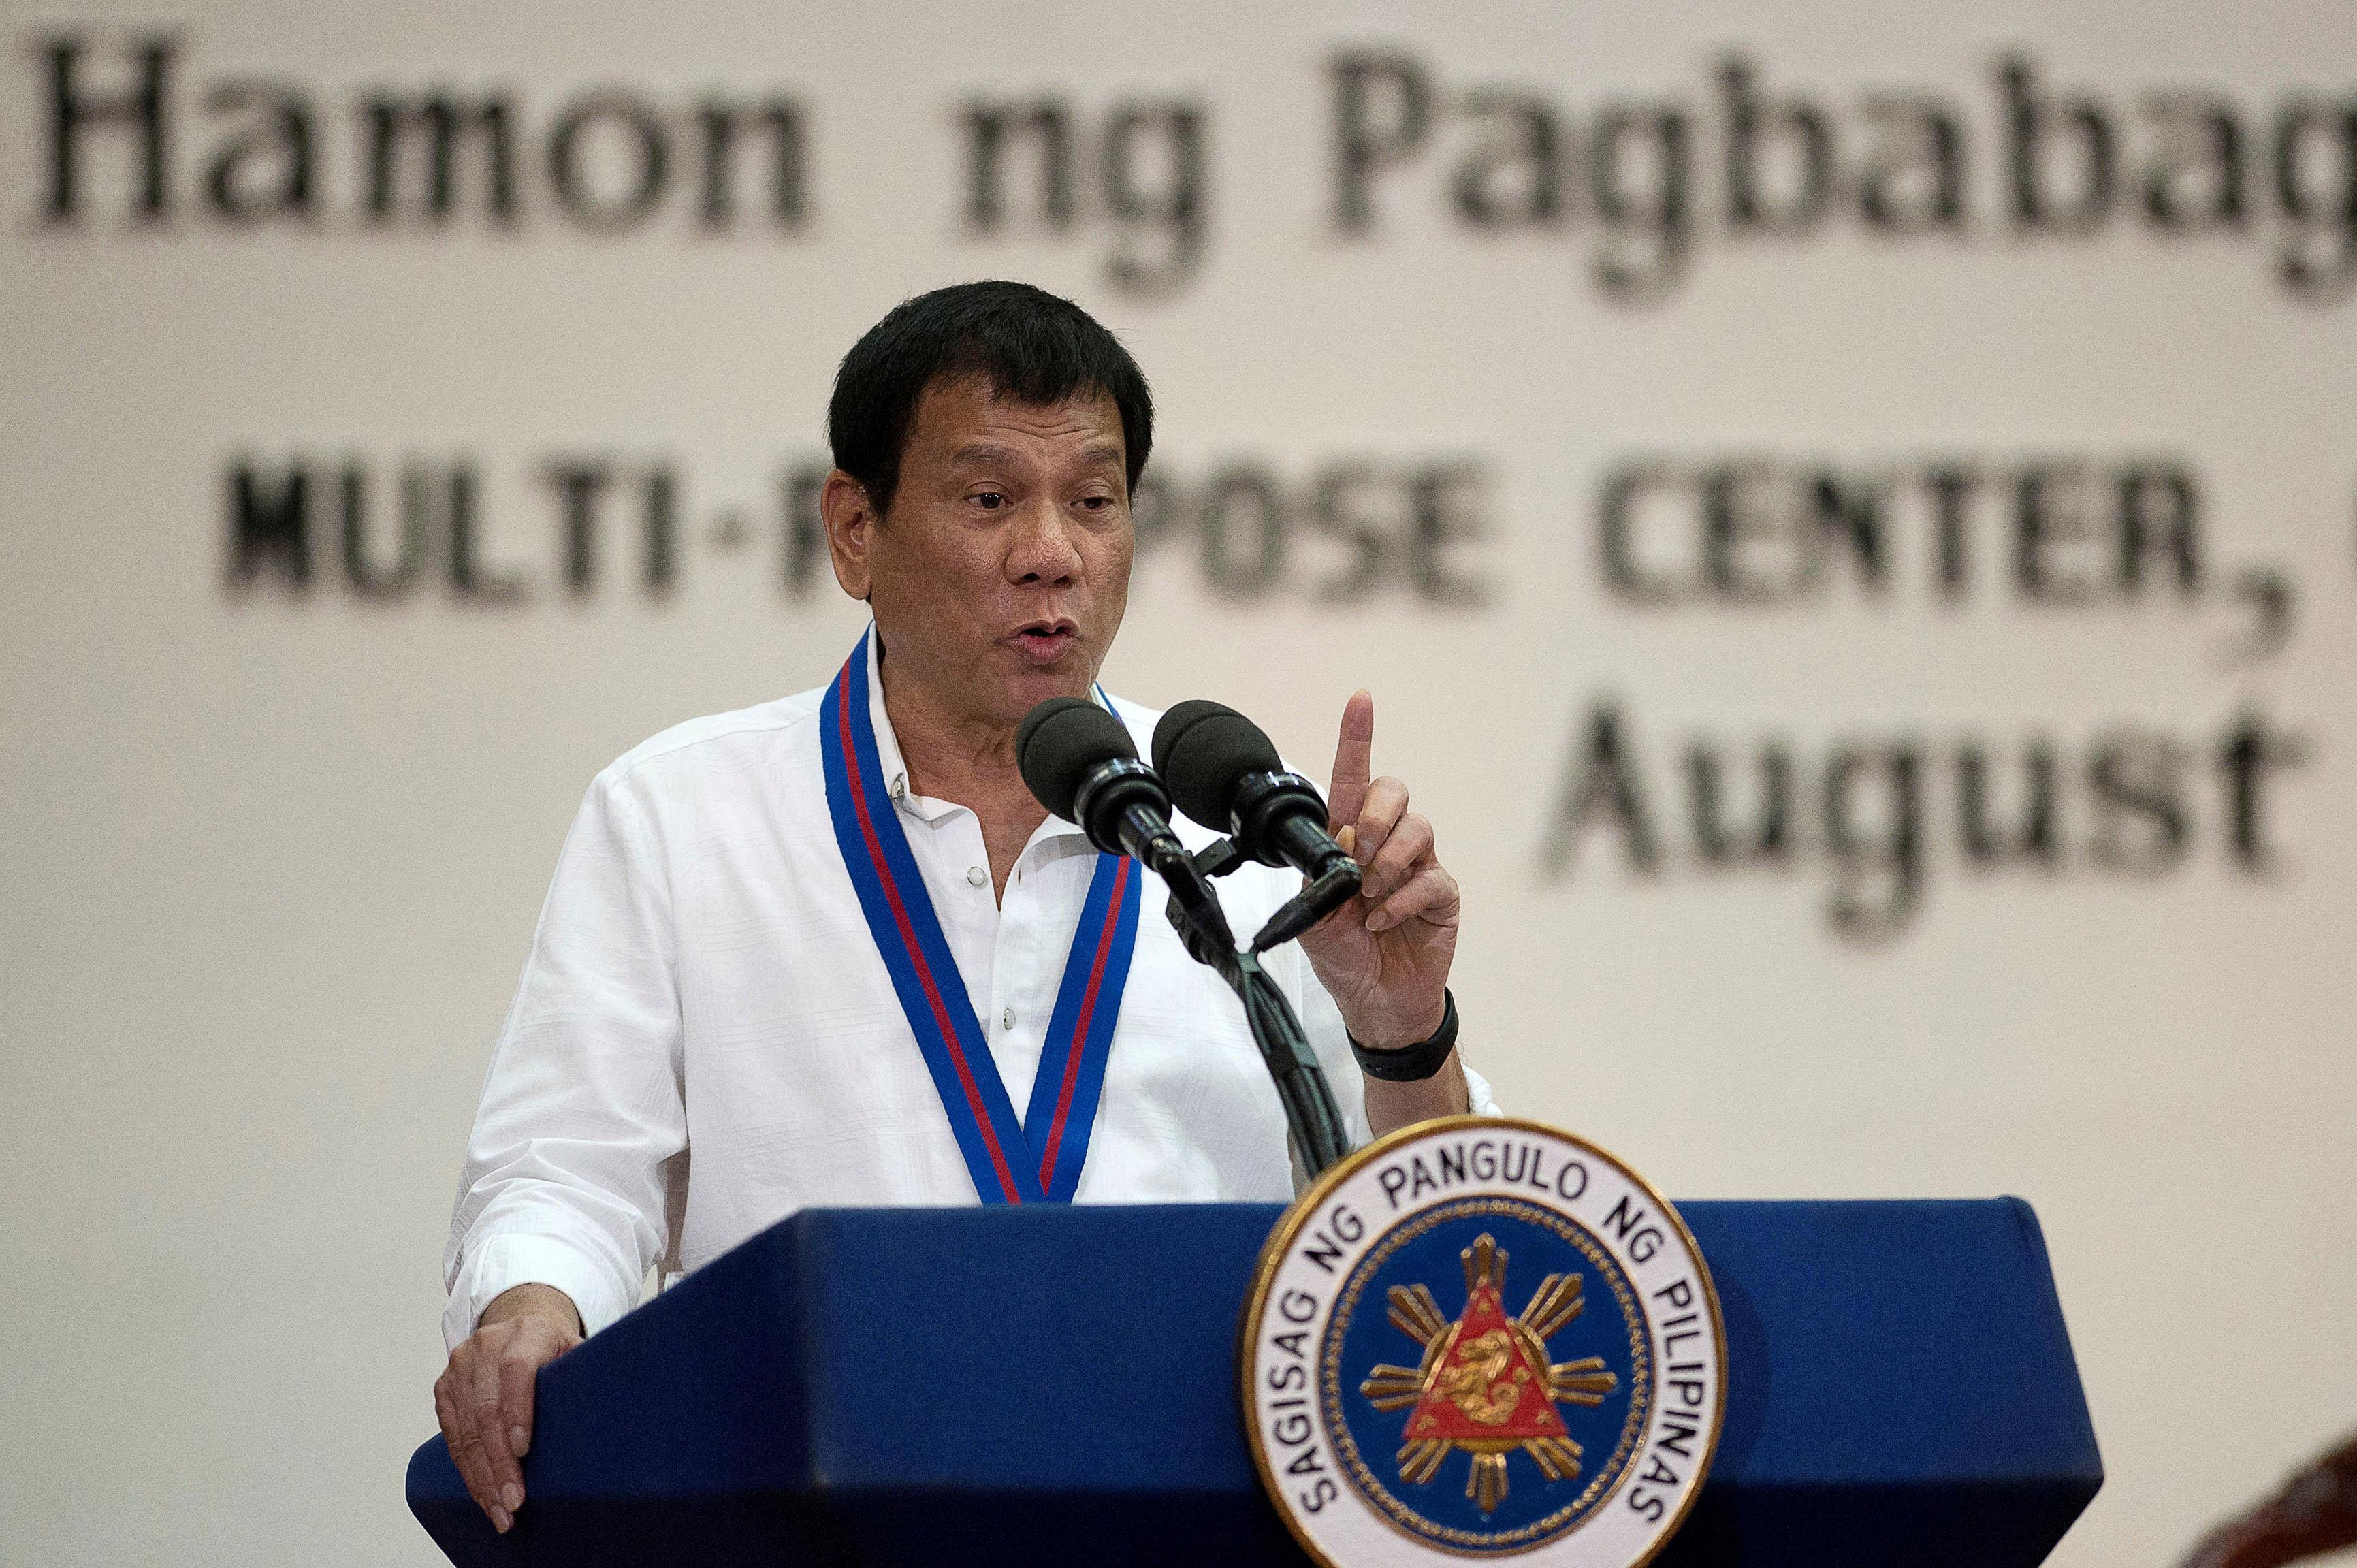 Philippine President Rodrigo Duterte Fires 'Thousands' of Government Officials